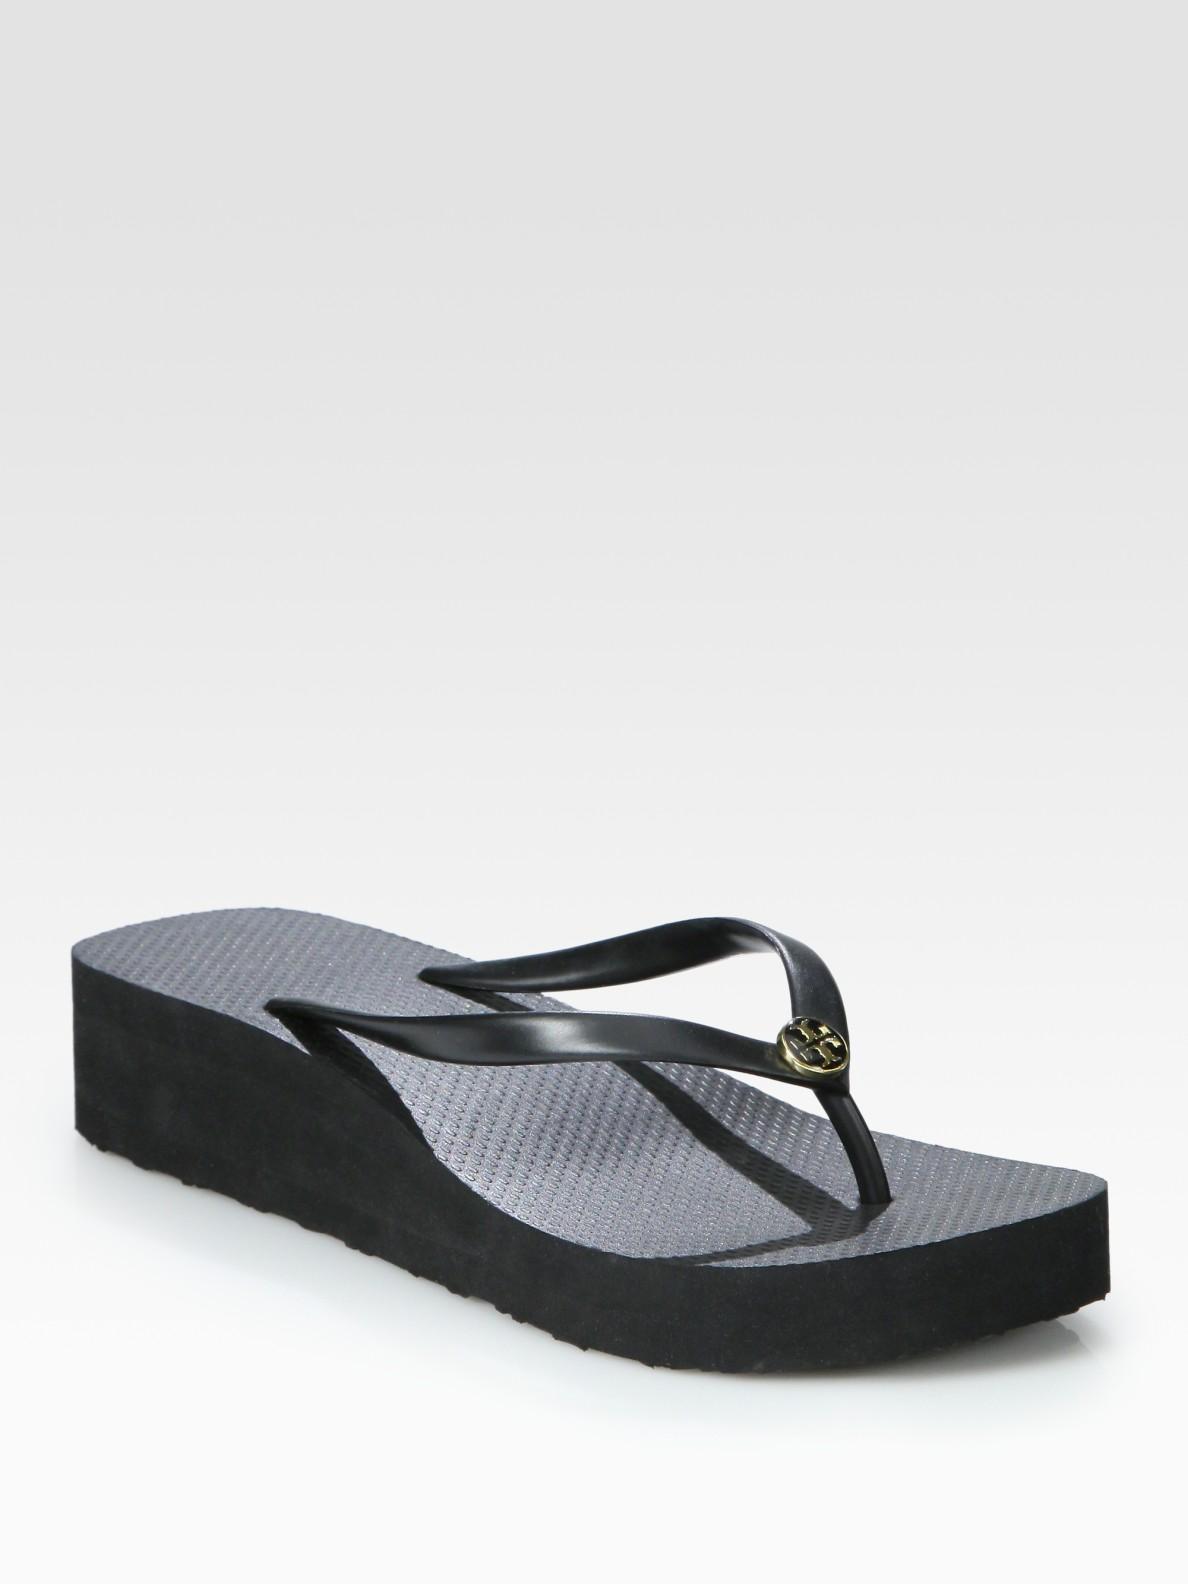 Tory Burch Womens Shoes Sale